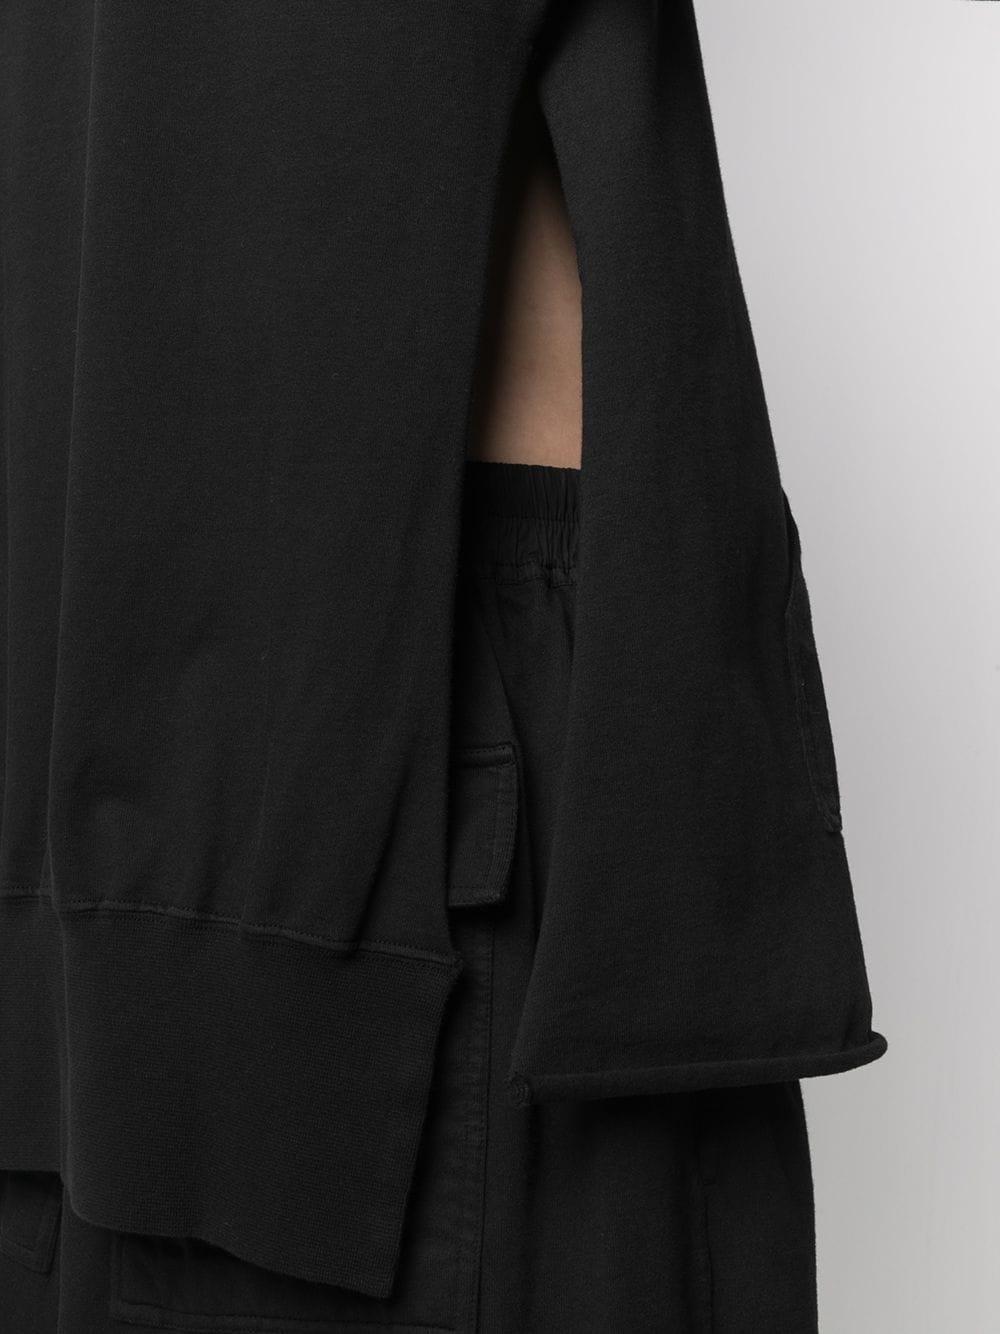 PONCHO HOODIE RICK OWENS DRKSHDW | Sweatshirts | DU21S2282 RIG09